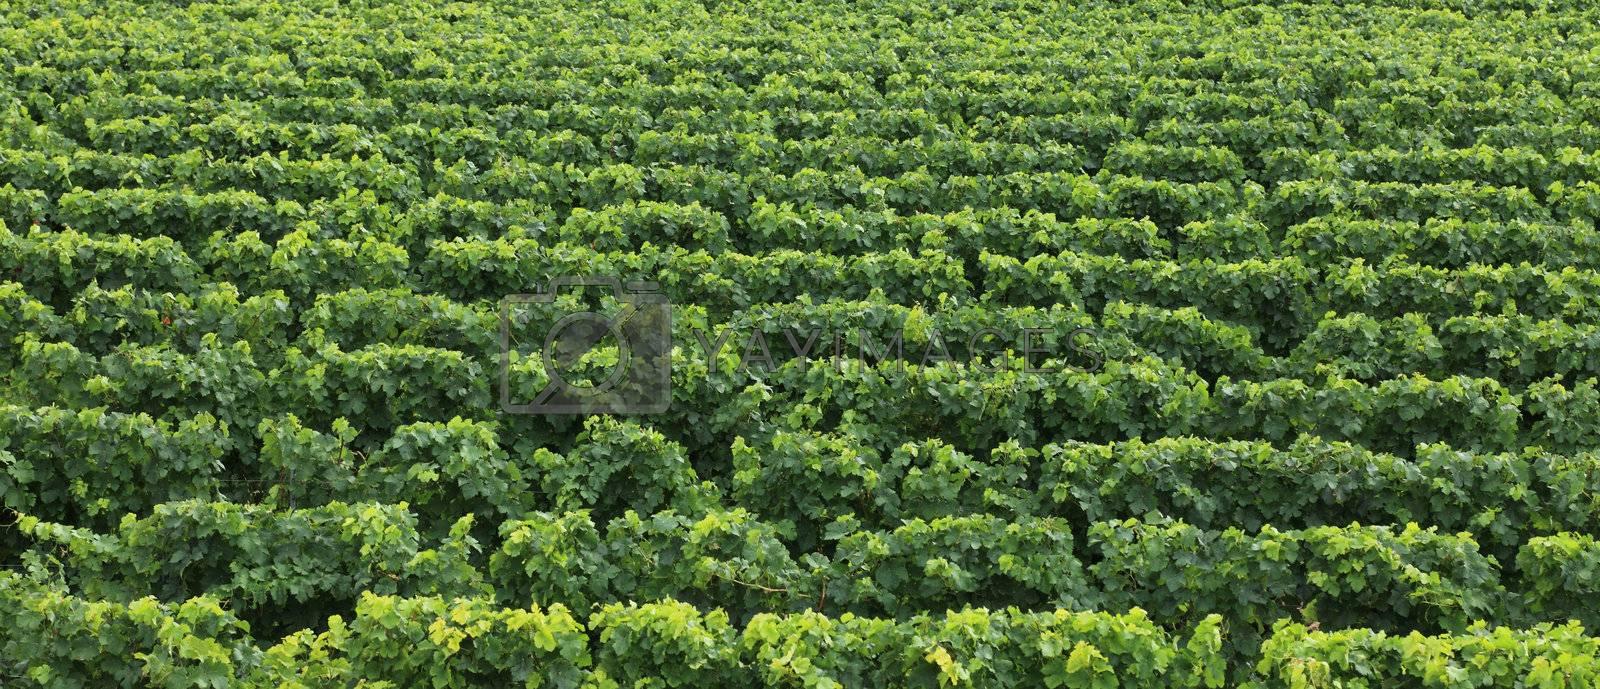 Upper image of a vineyard creating an interesting green natural texture.